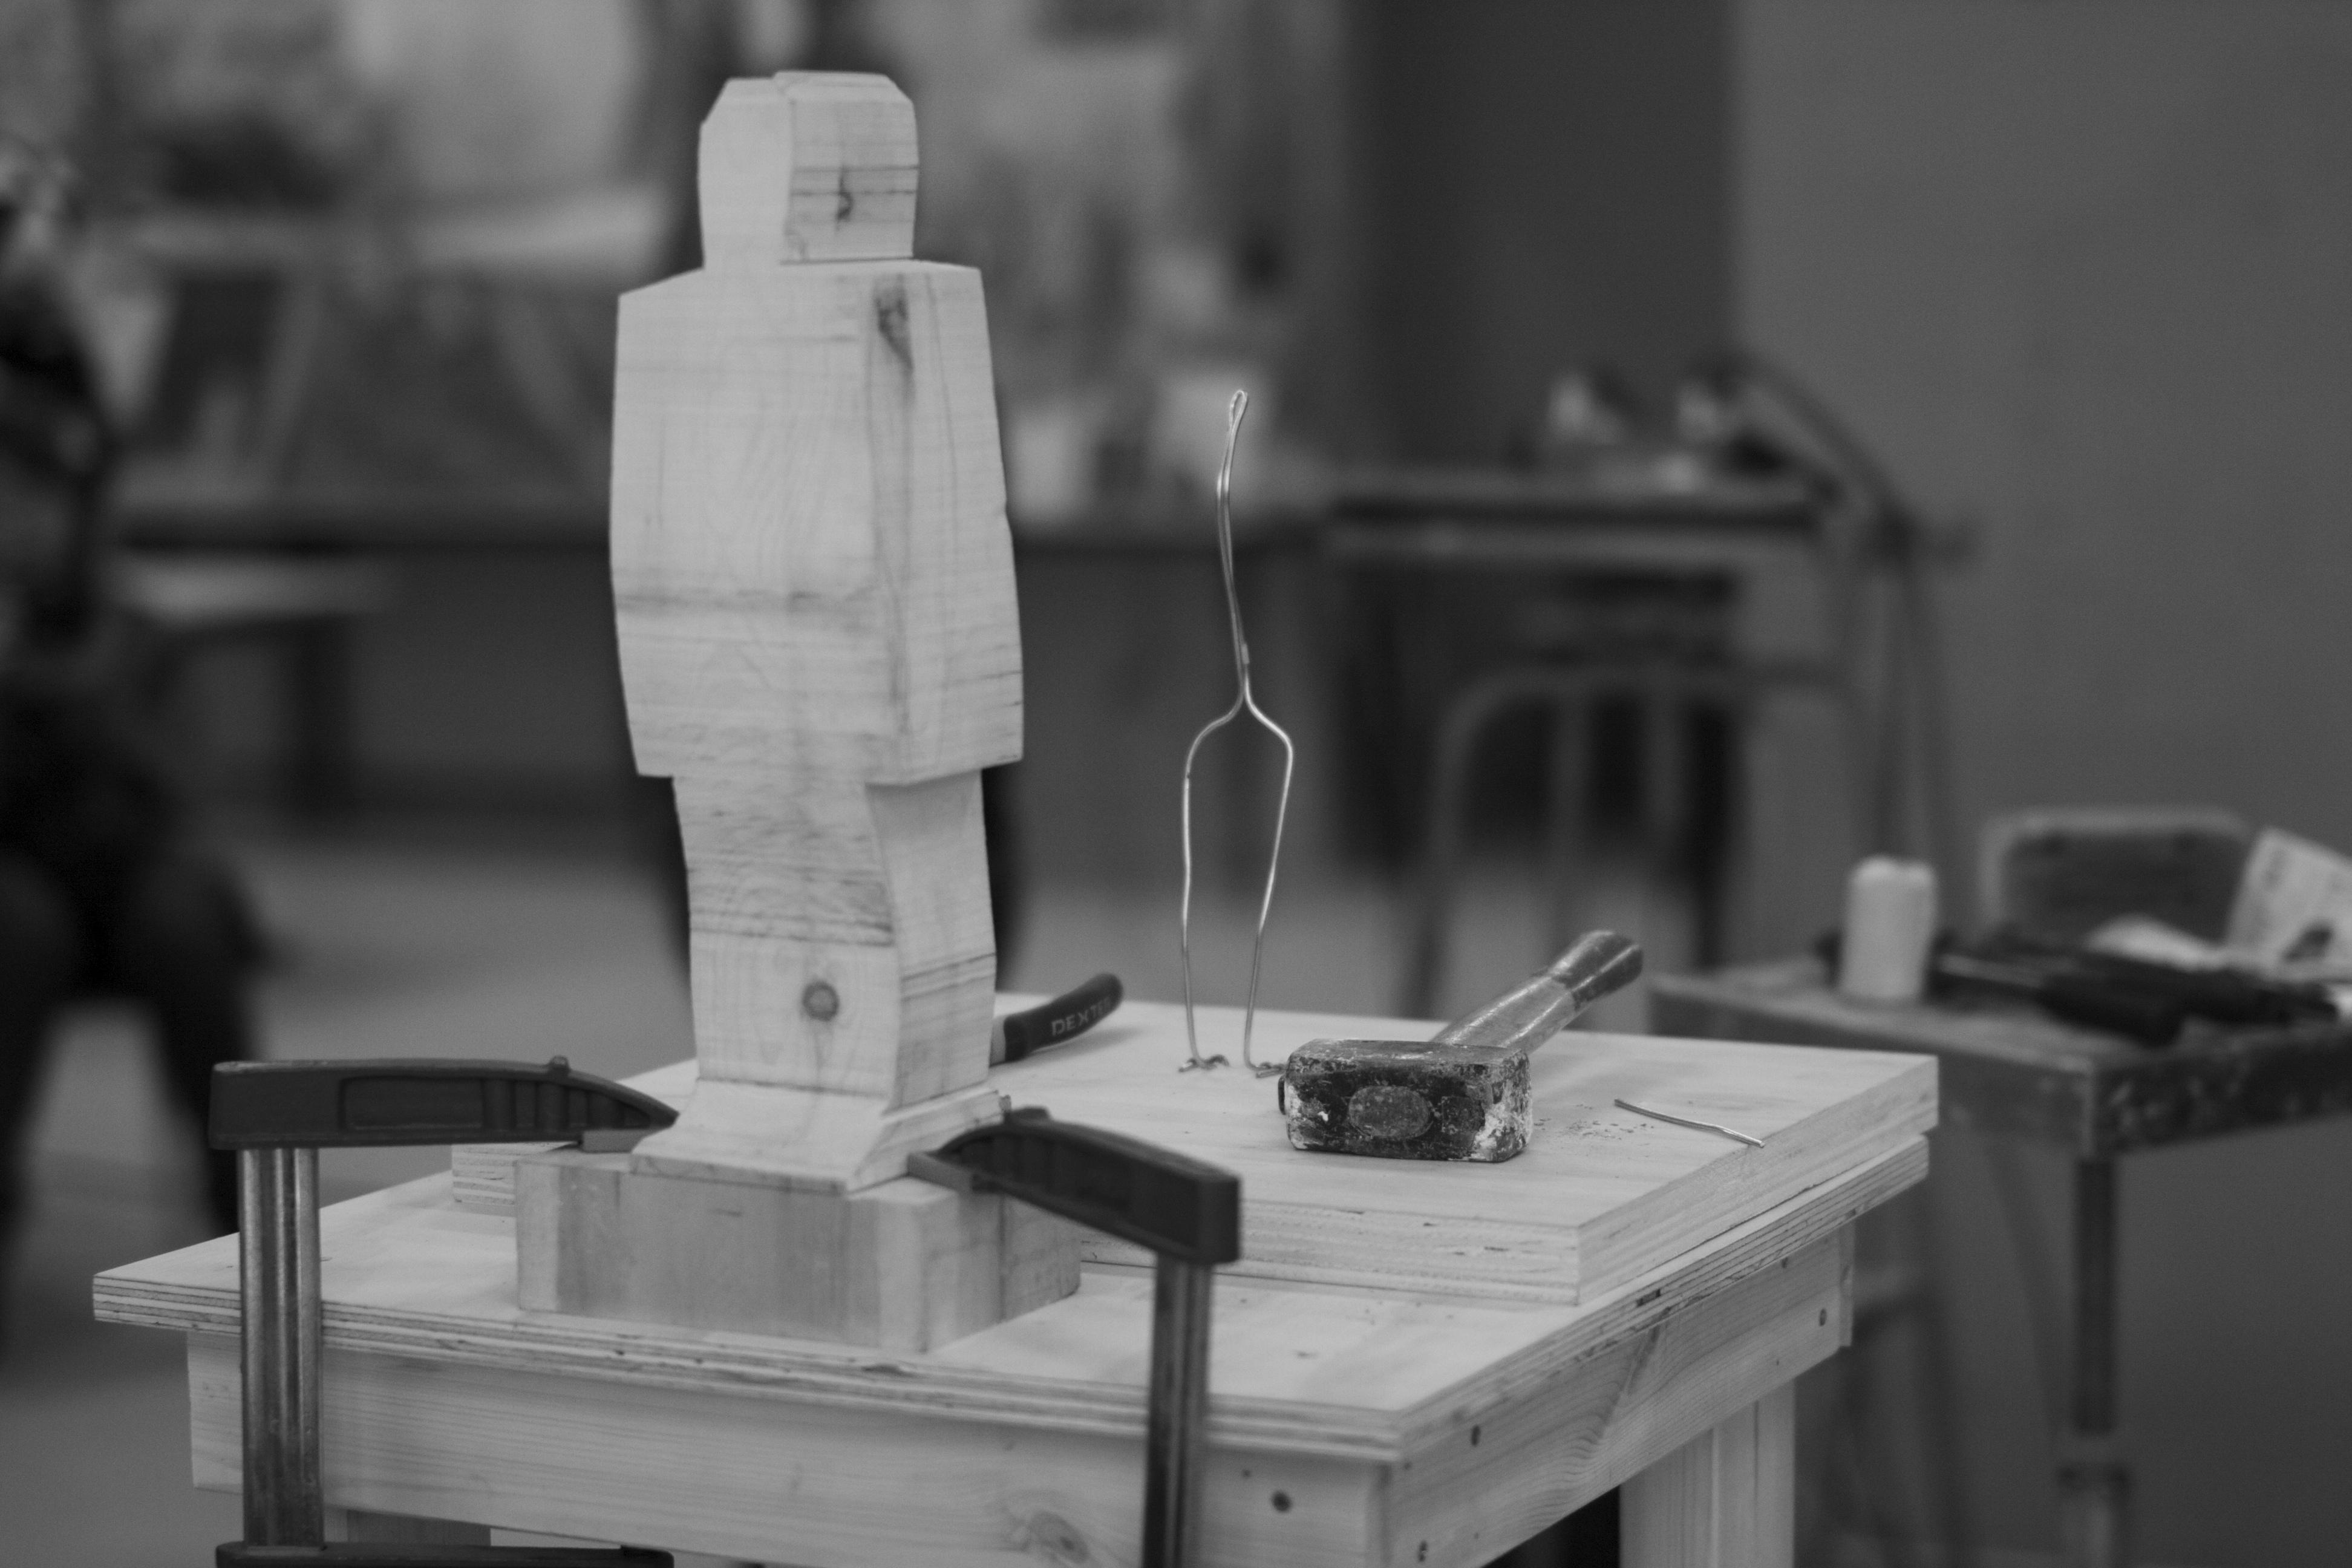 Flickr - Aron Demetz - Dialoghi e materia - Workshop a cura di Franco Reina26